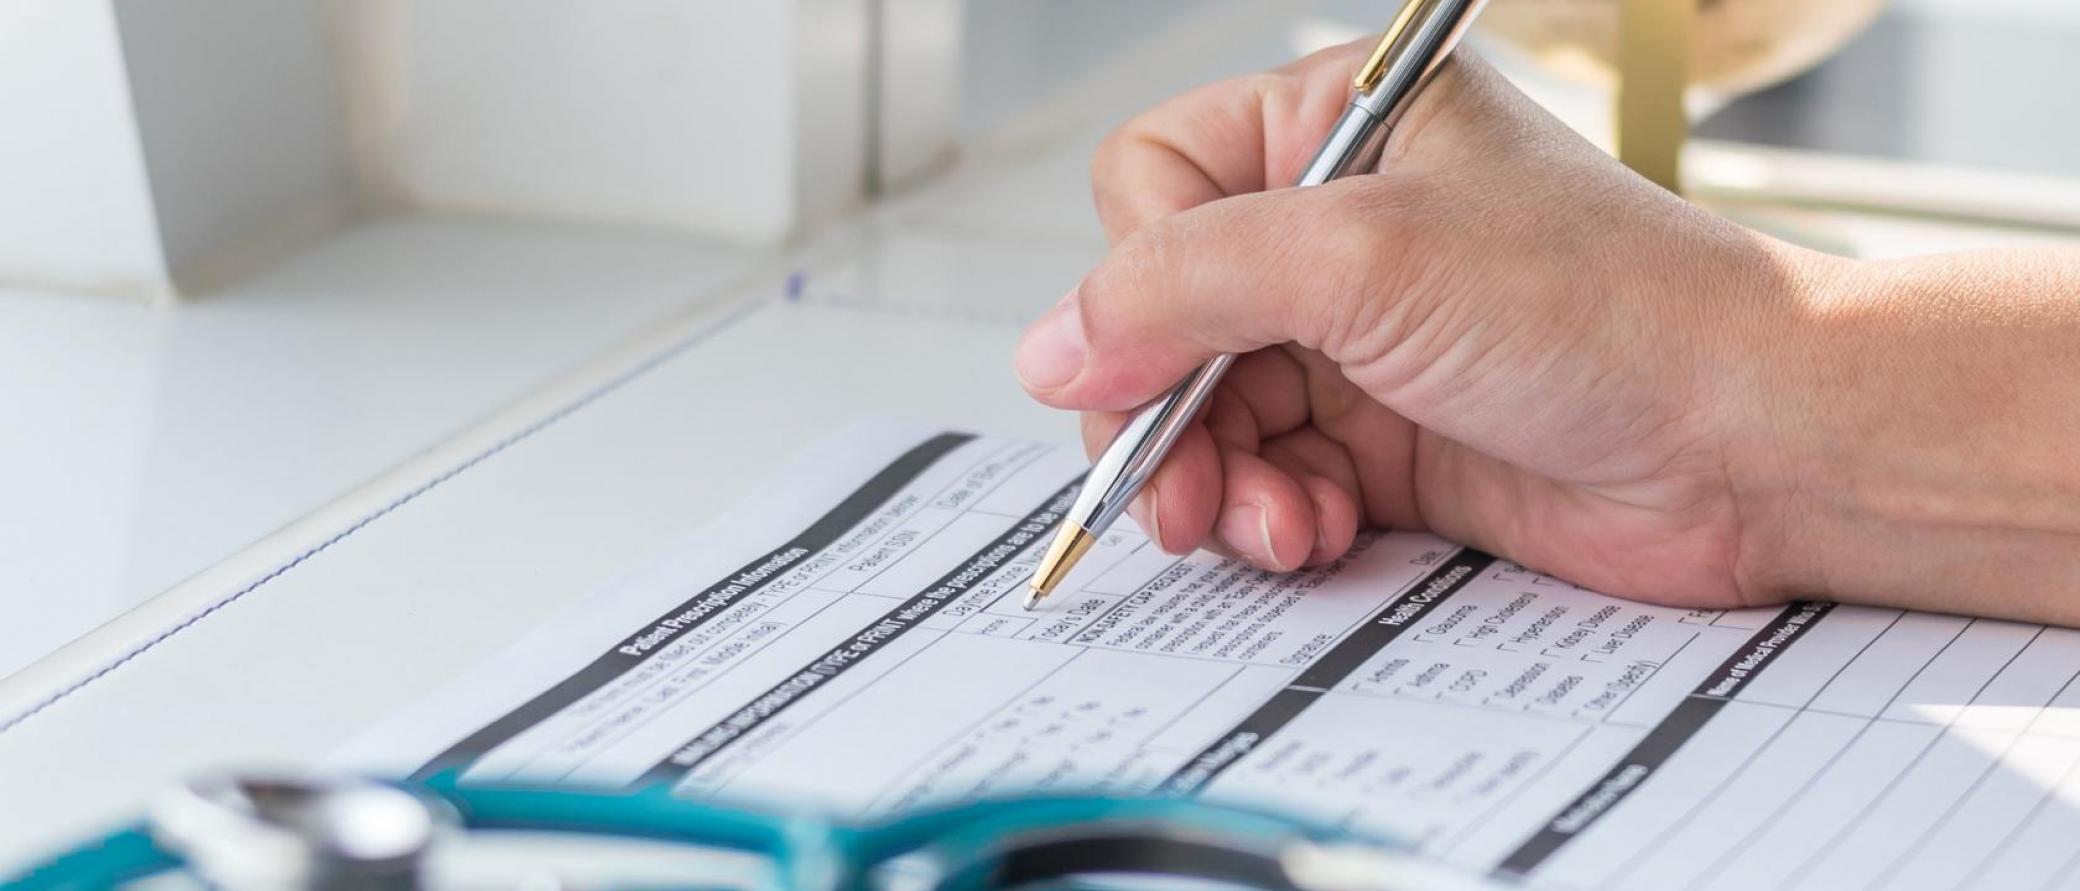 Hand of a doctor writing a prescription